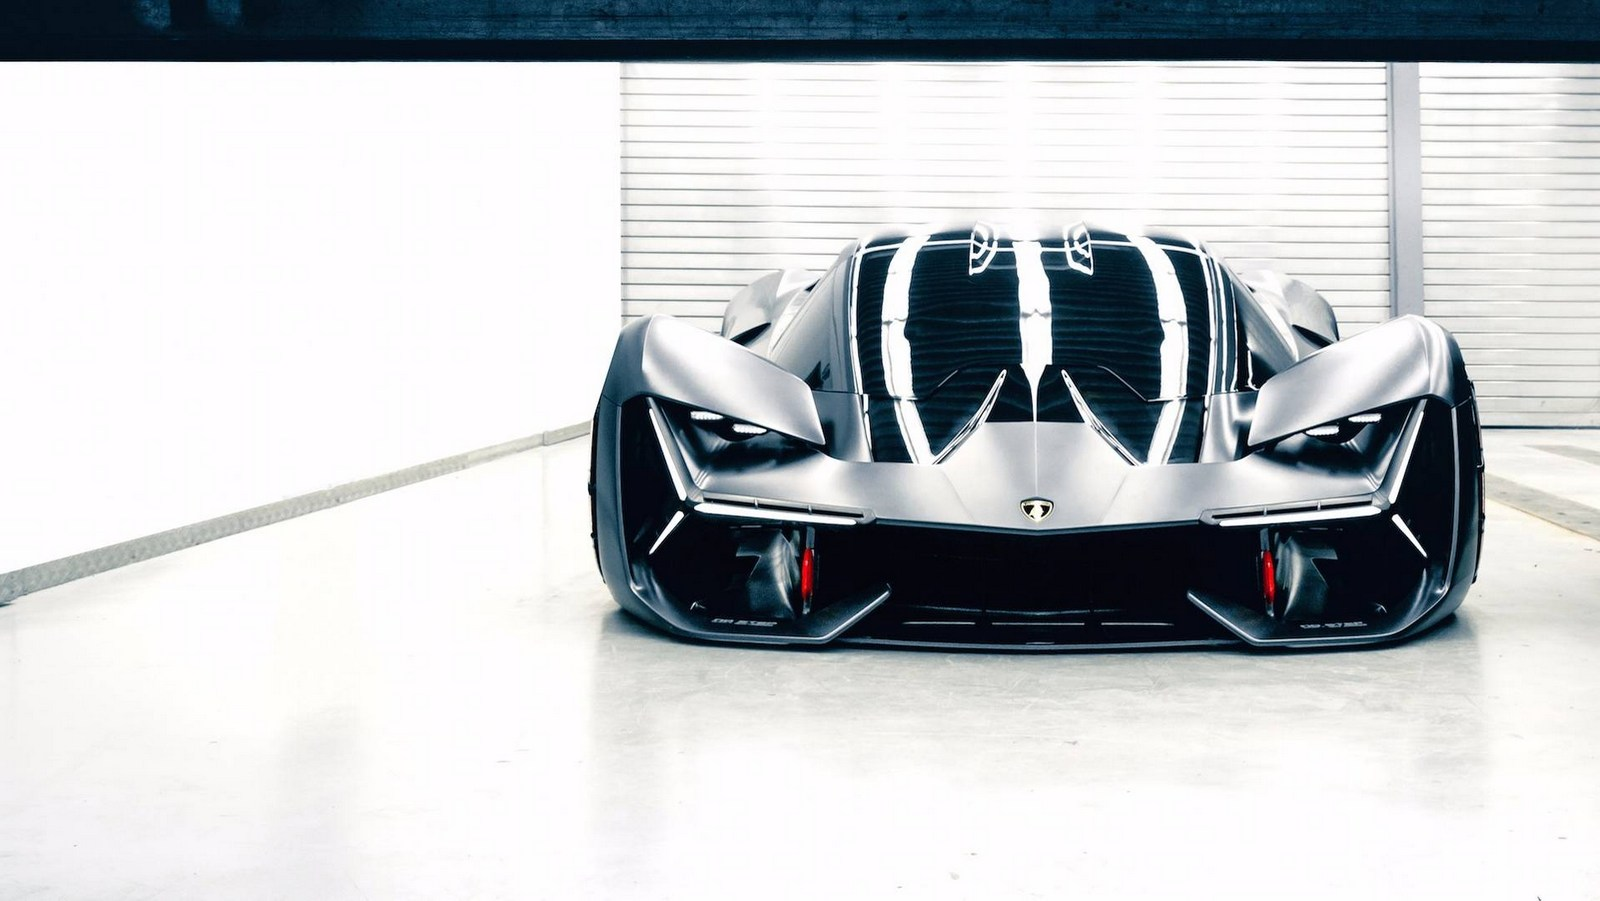 Lamborghini Terzo Millennio Concept Is A Supercar For The Third Millennium Carscoops